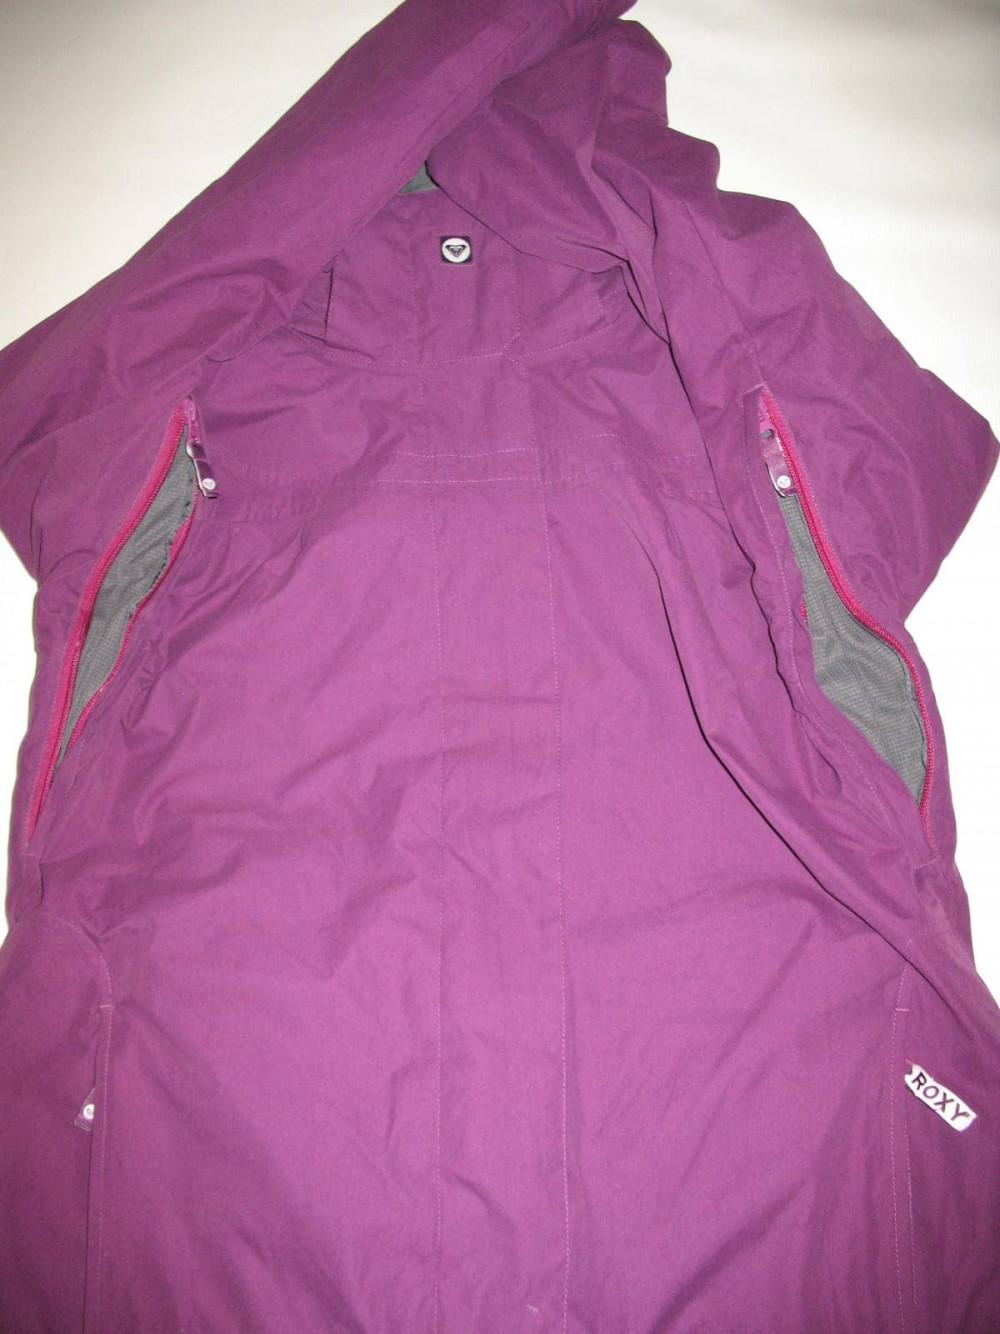 Куртка ROXY silver snowboard/ski jacket lady (размер L) - 4